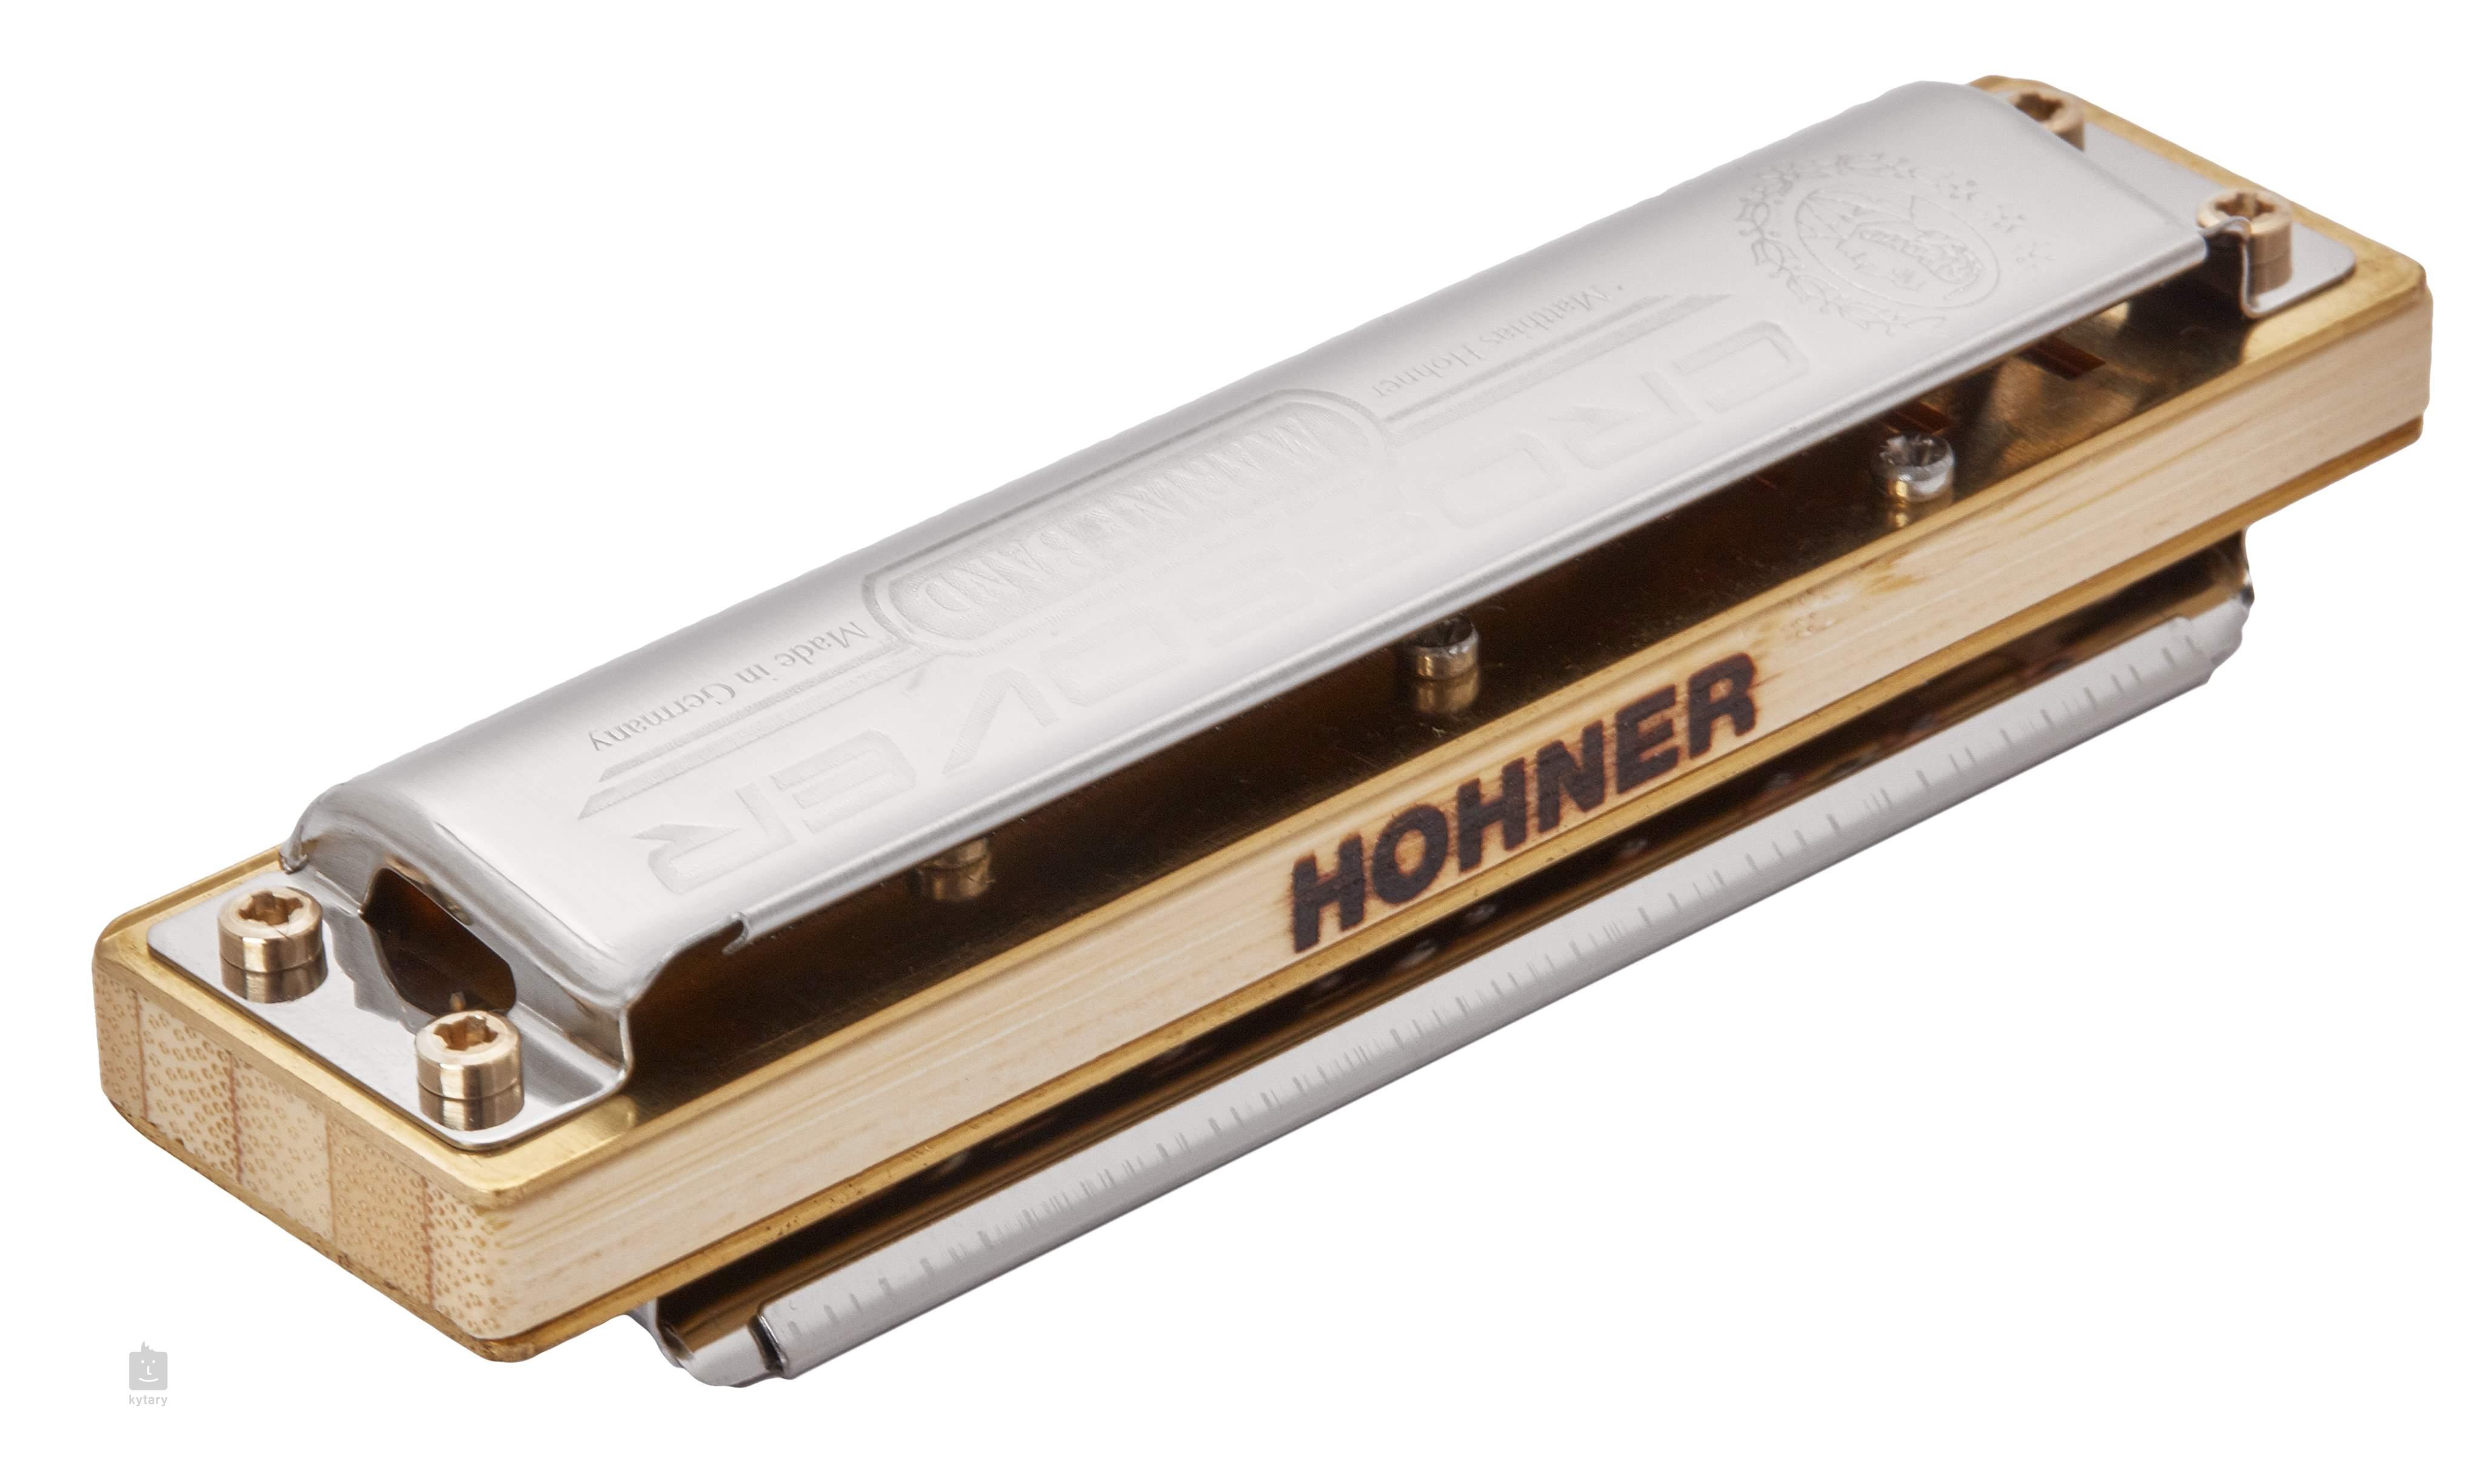 hohner marine band crossover b major harmonica. Black Bedroom Furniture Sets. Home Design Ideas